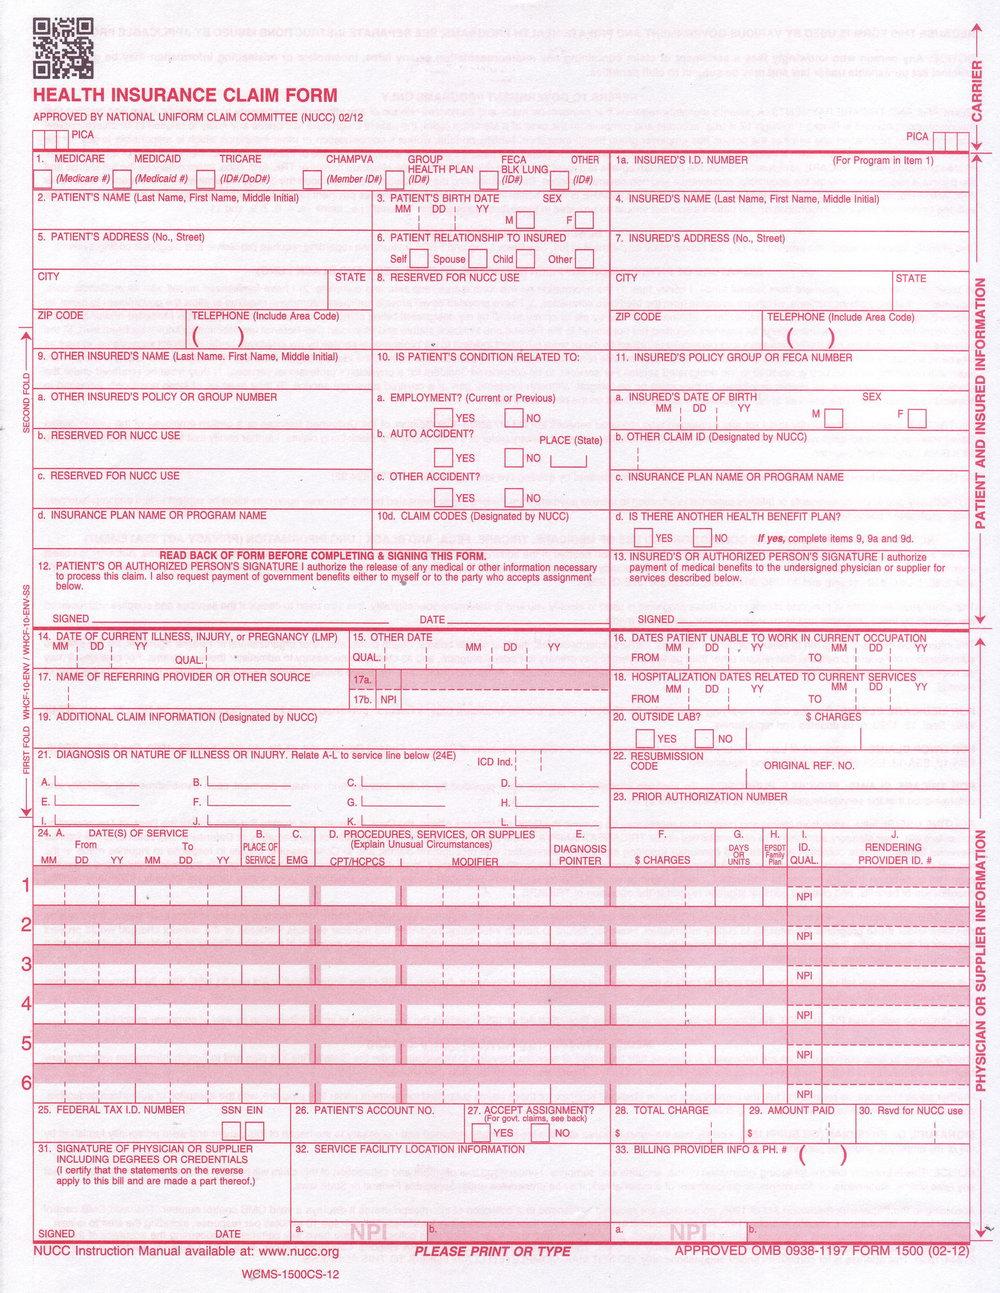 Free Cms 1500 Form Printable